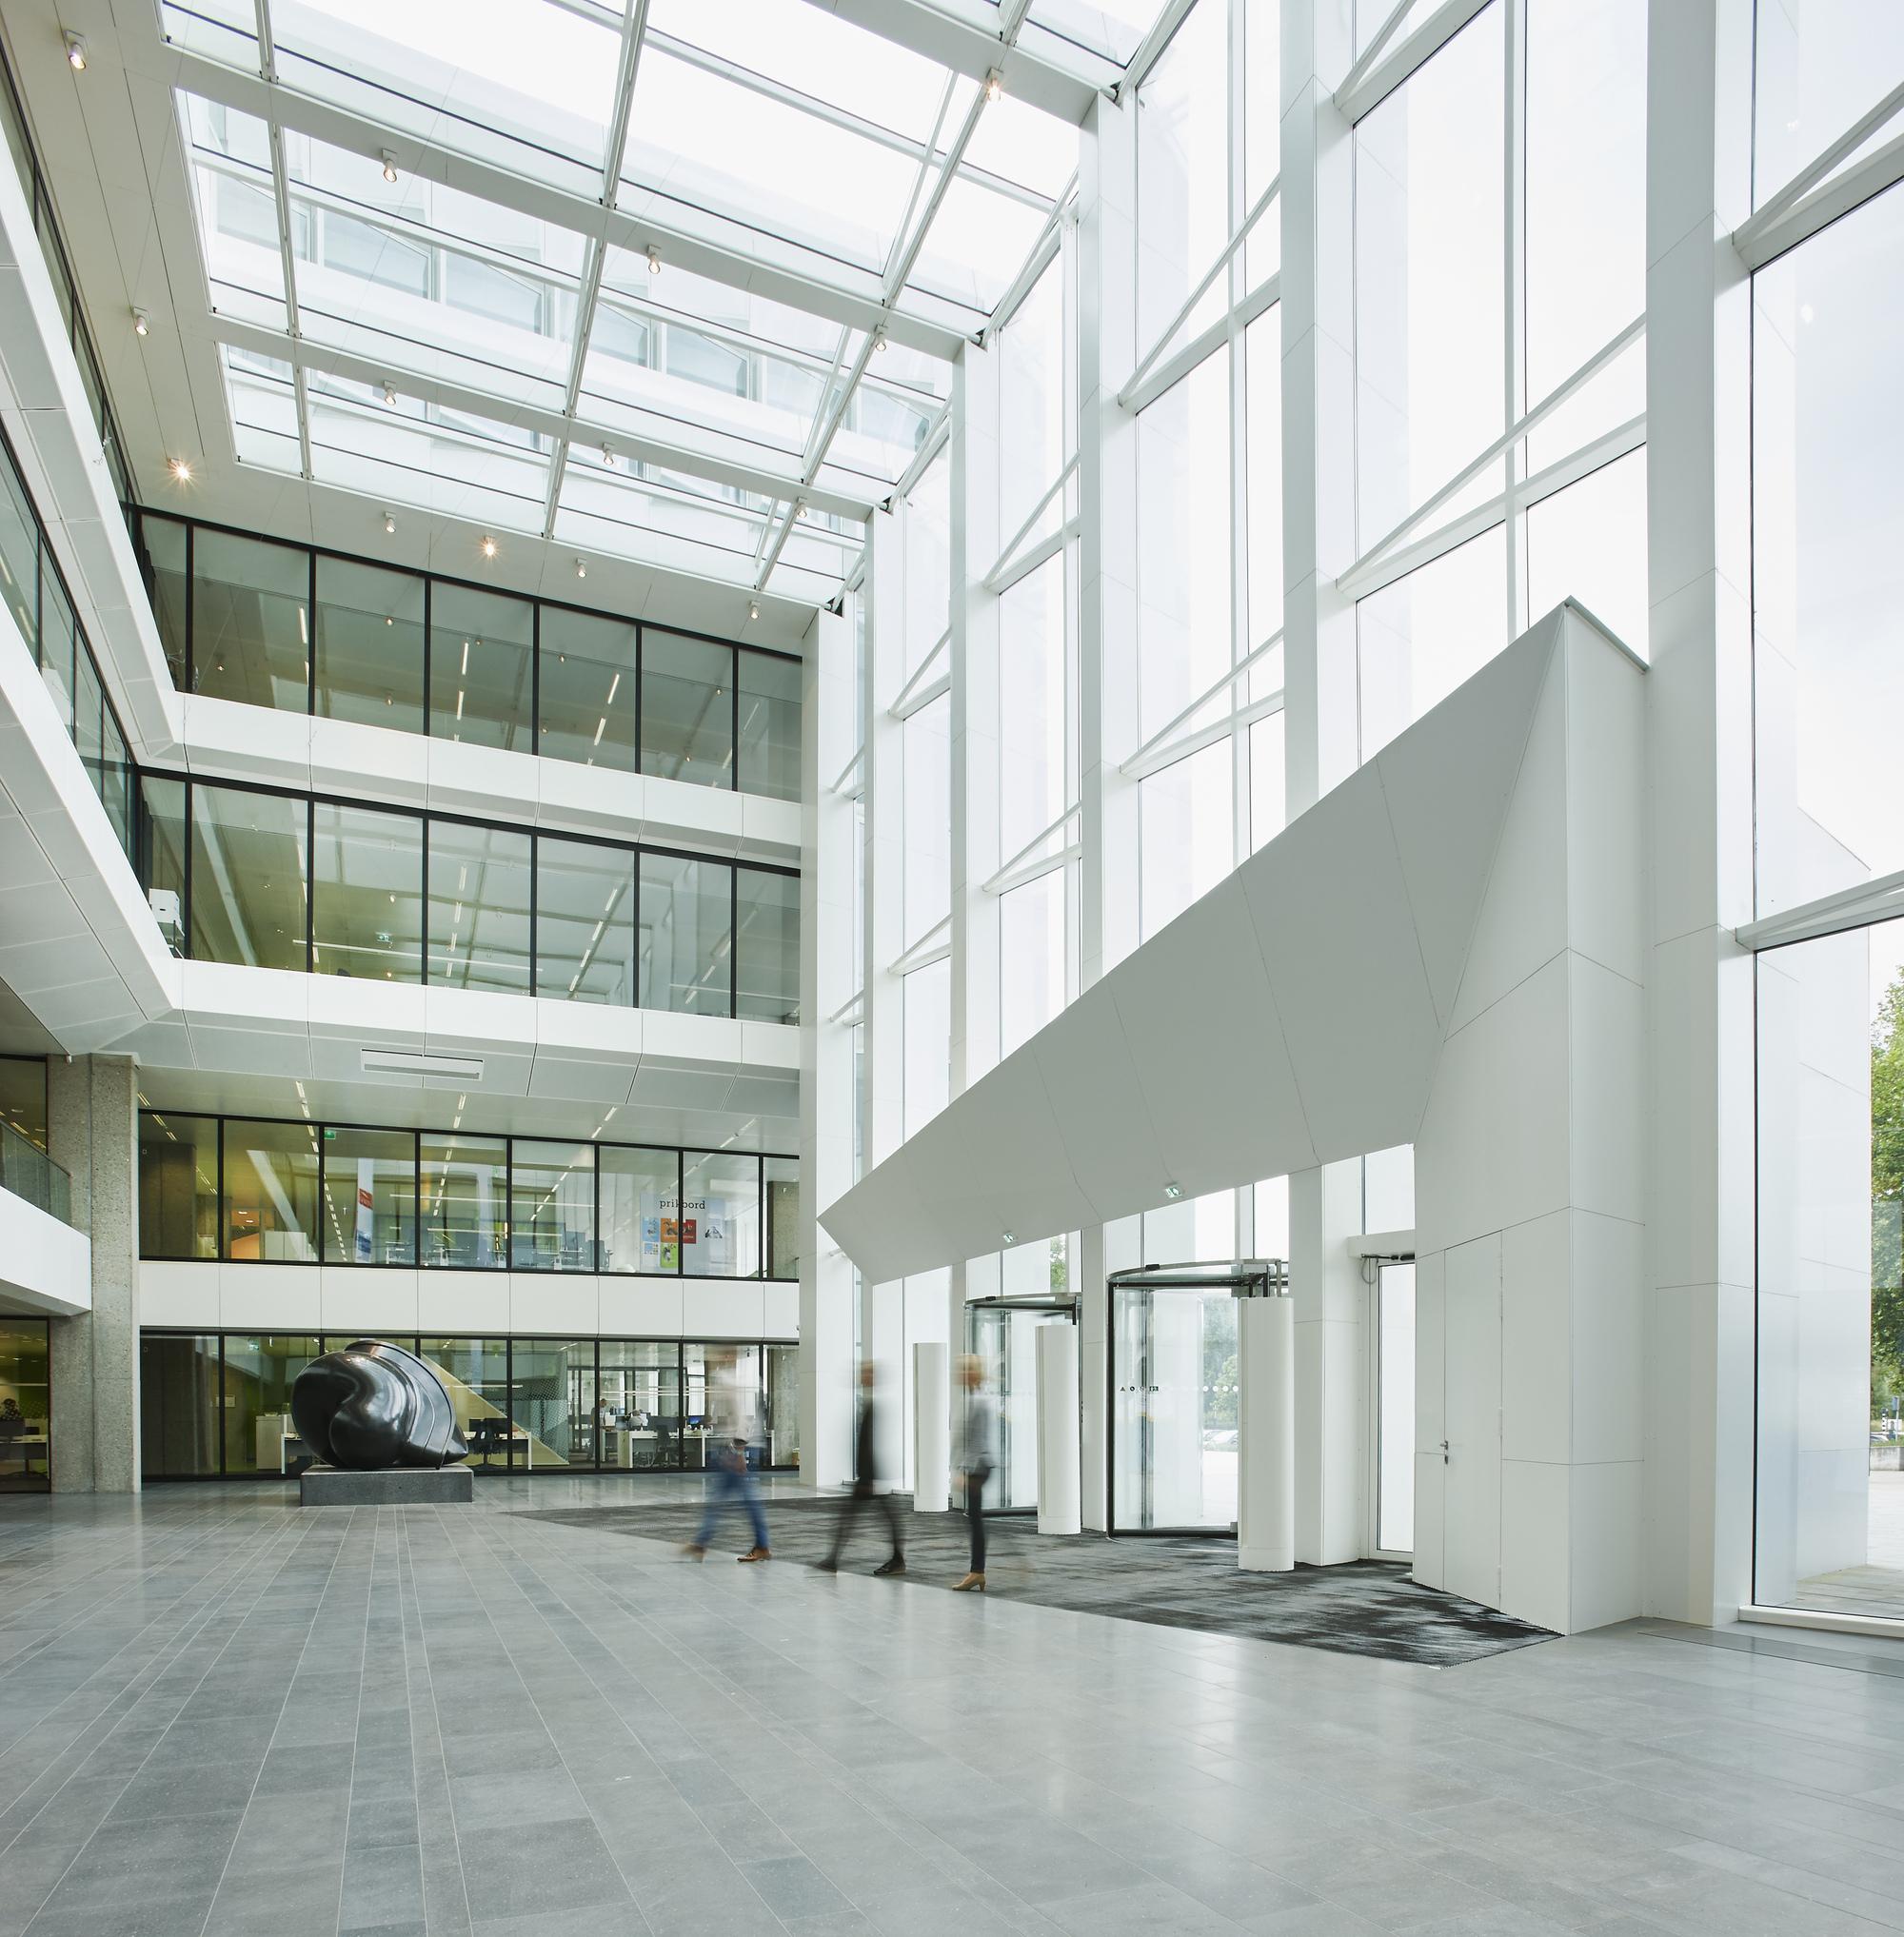 Gallery Of A.S.R Headquarters Renovation / Team V